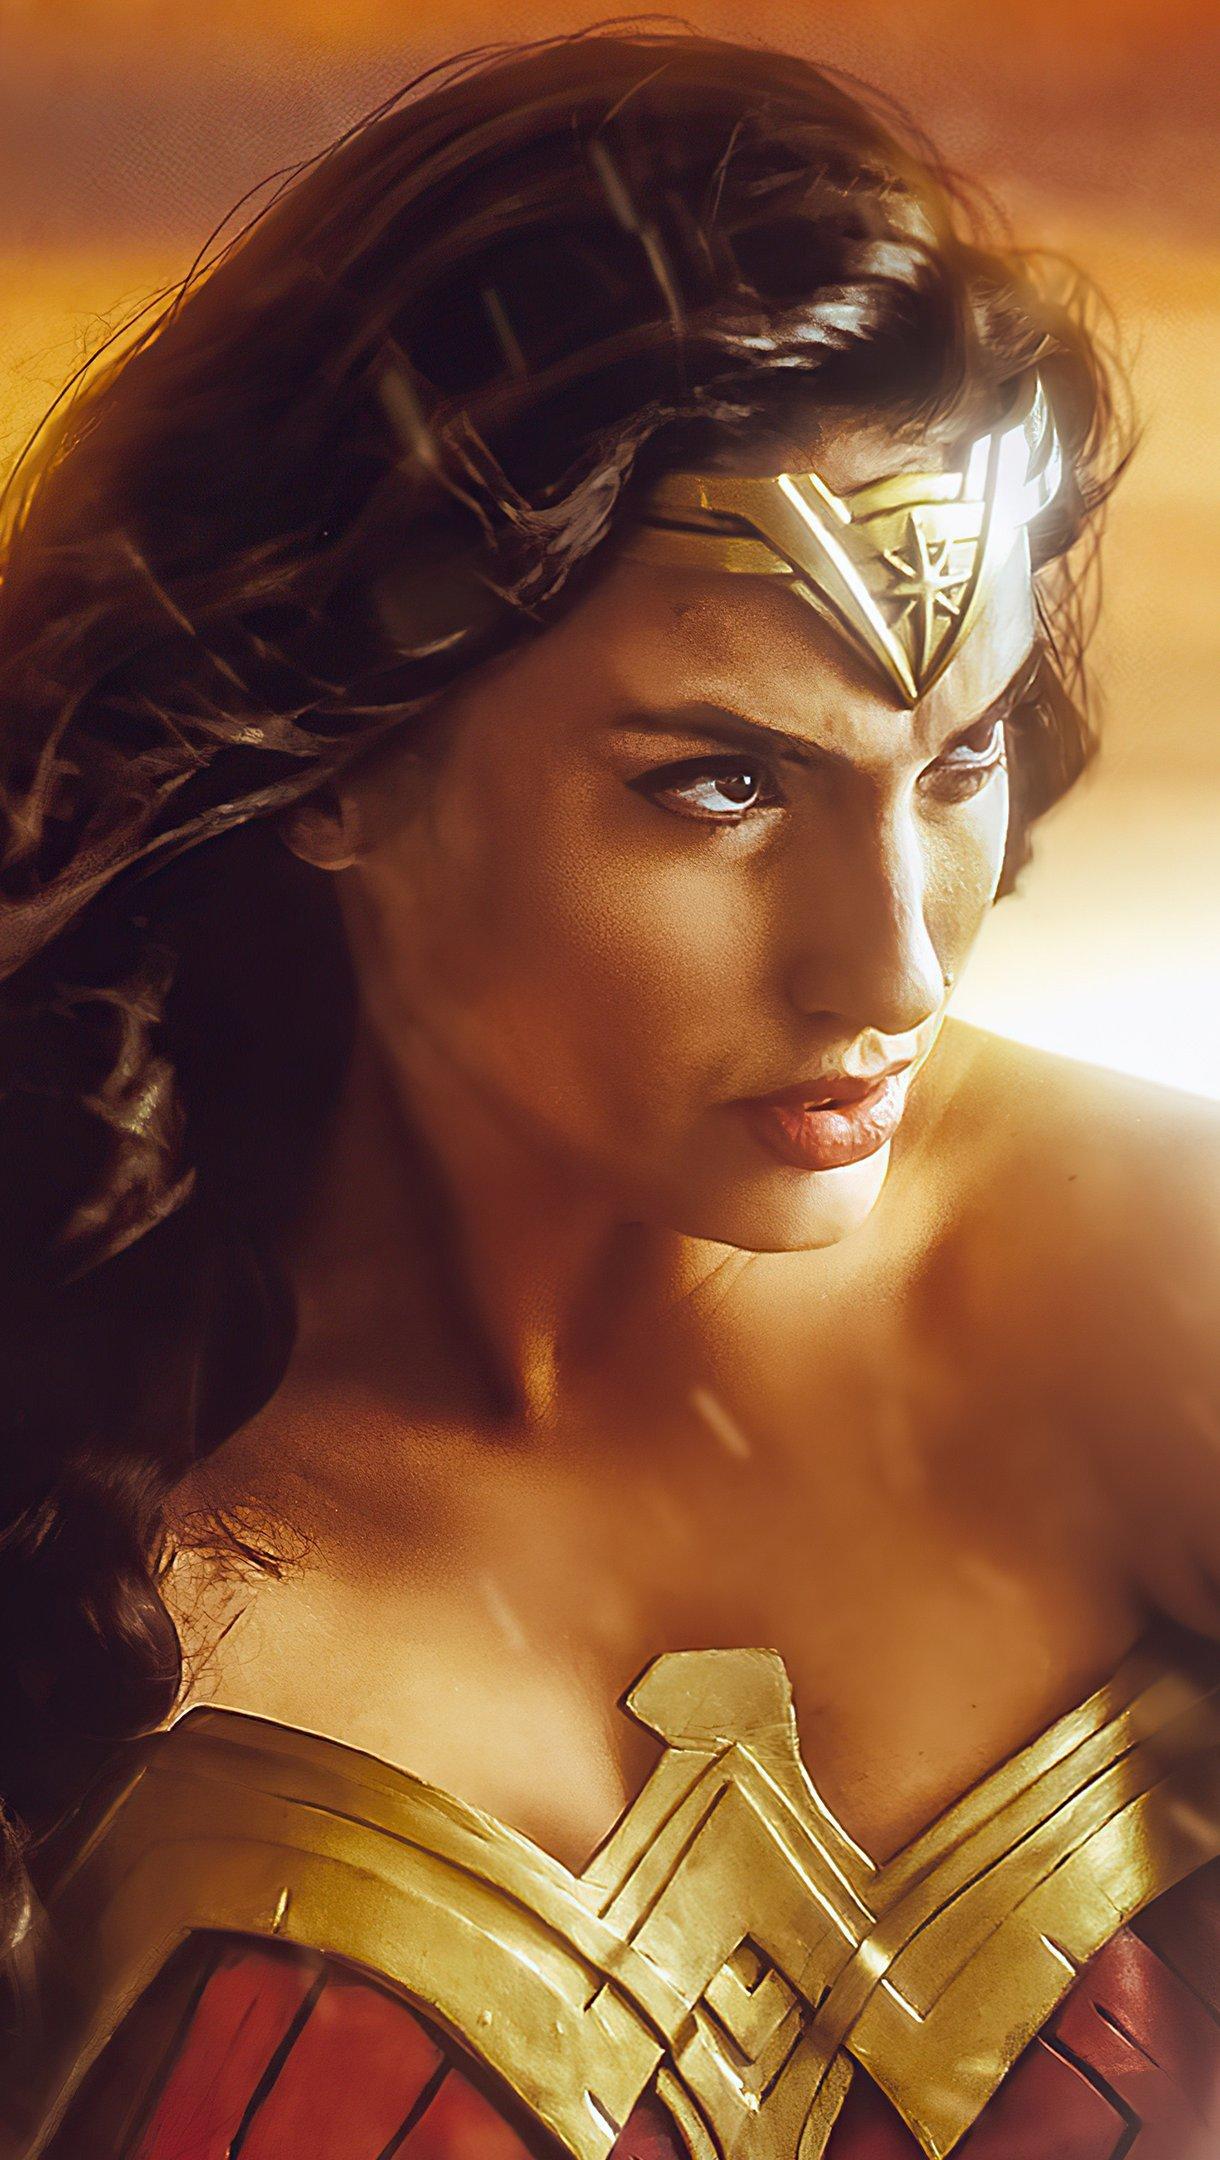 Wallpaper Princess of Themyscira Vertical